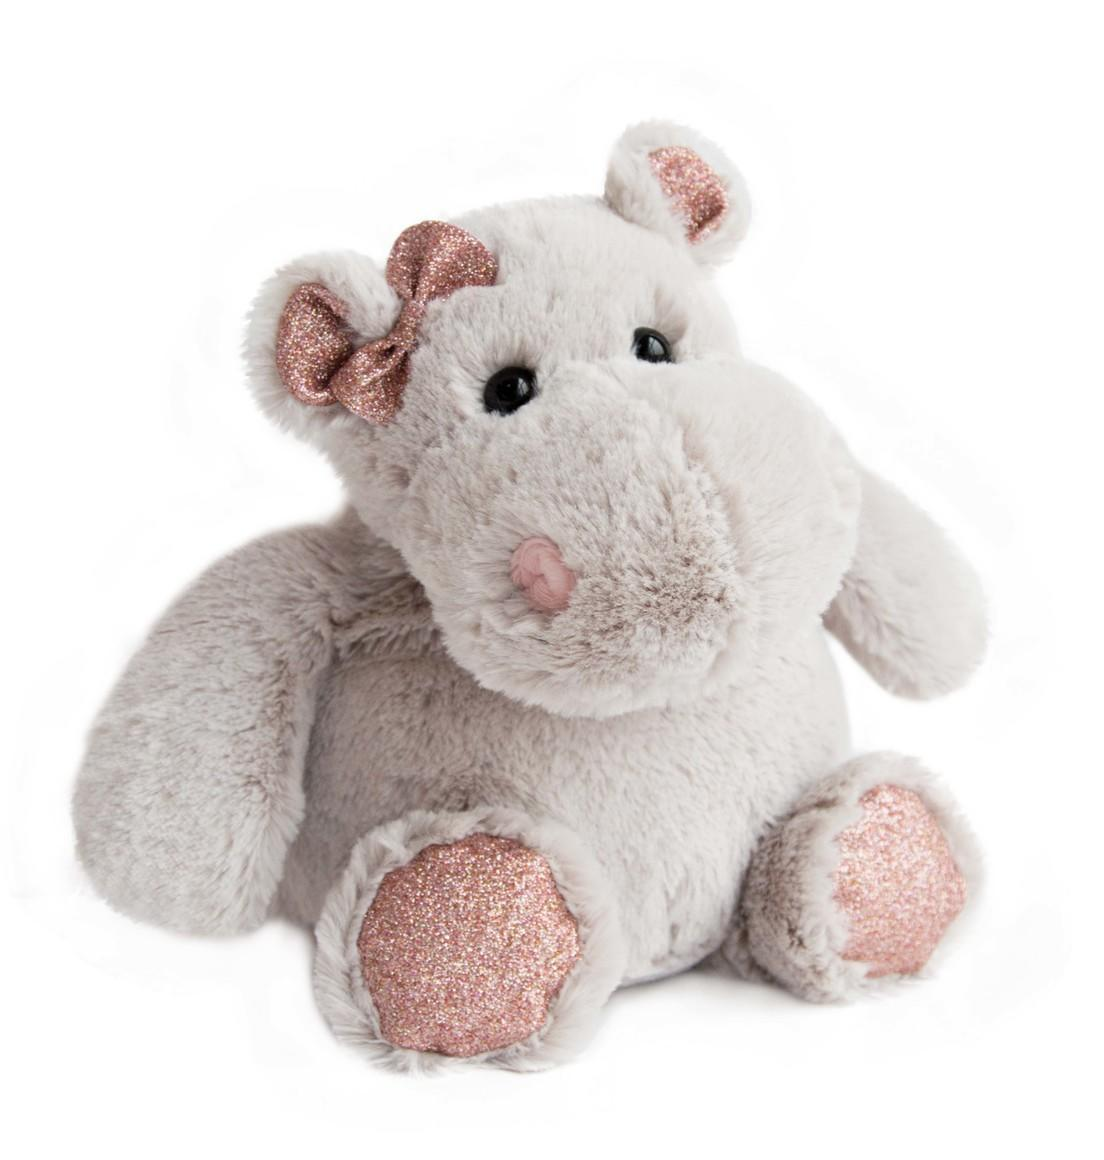 hippo girl 25 cm + gift box   Trada Marketplace